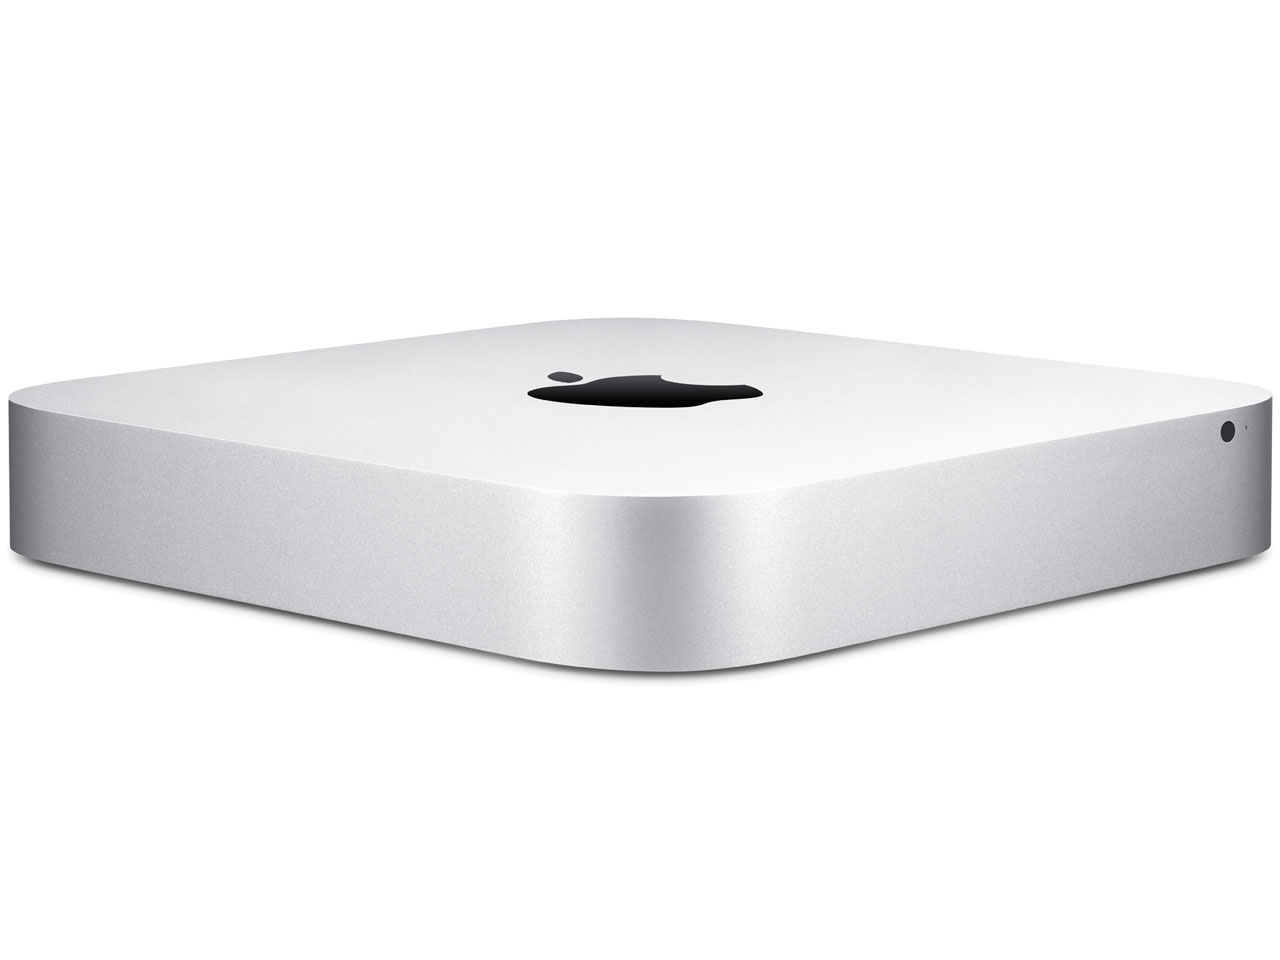 Apple Mac mini マックミニ 1400 MGEM2J/A HDD500GB Corei5 無線LAN Bluetooth iCloud MGEM2JAデスクトップPC モニタ別売